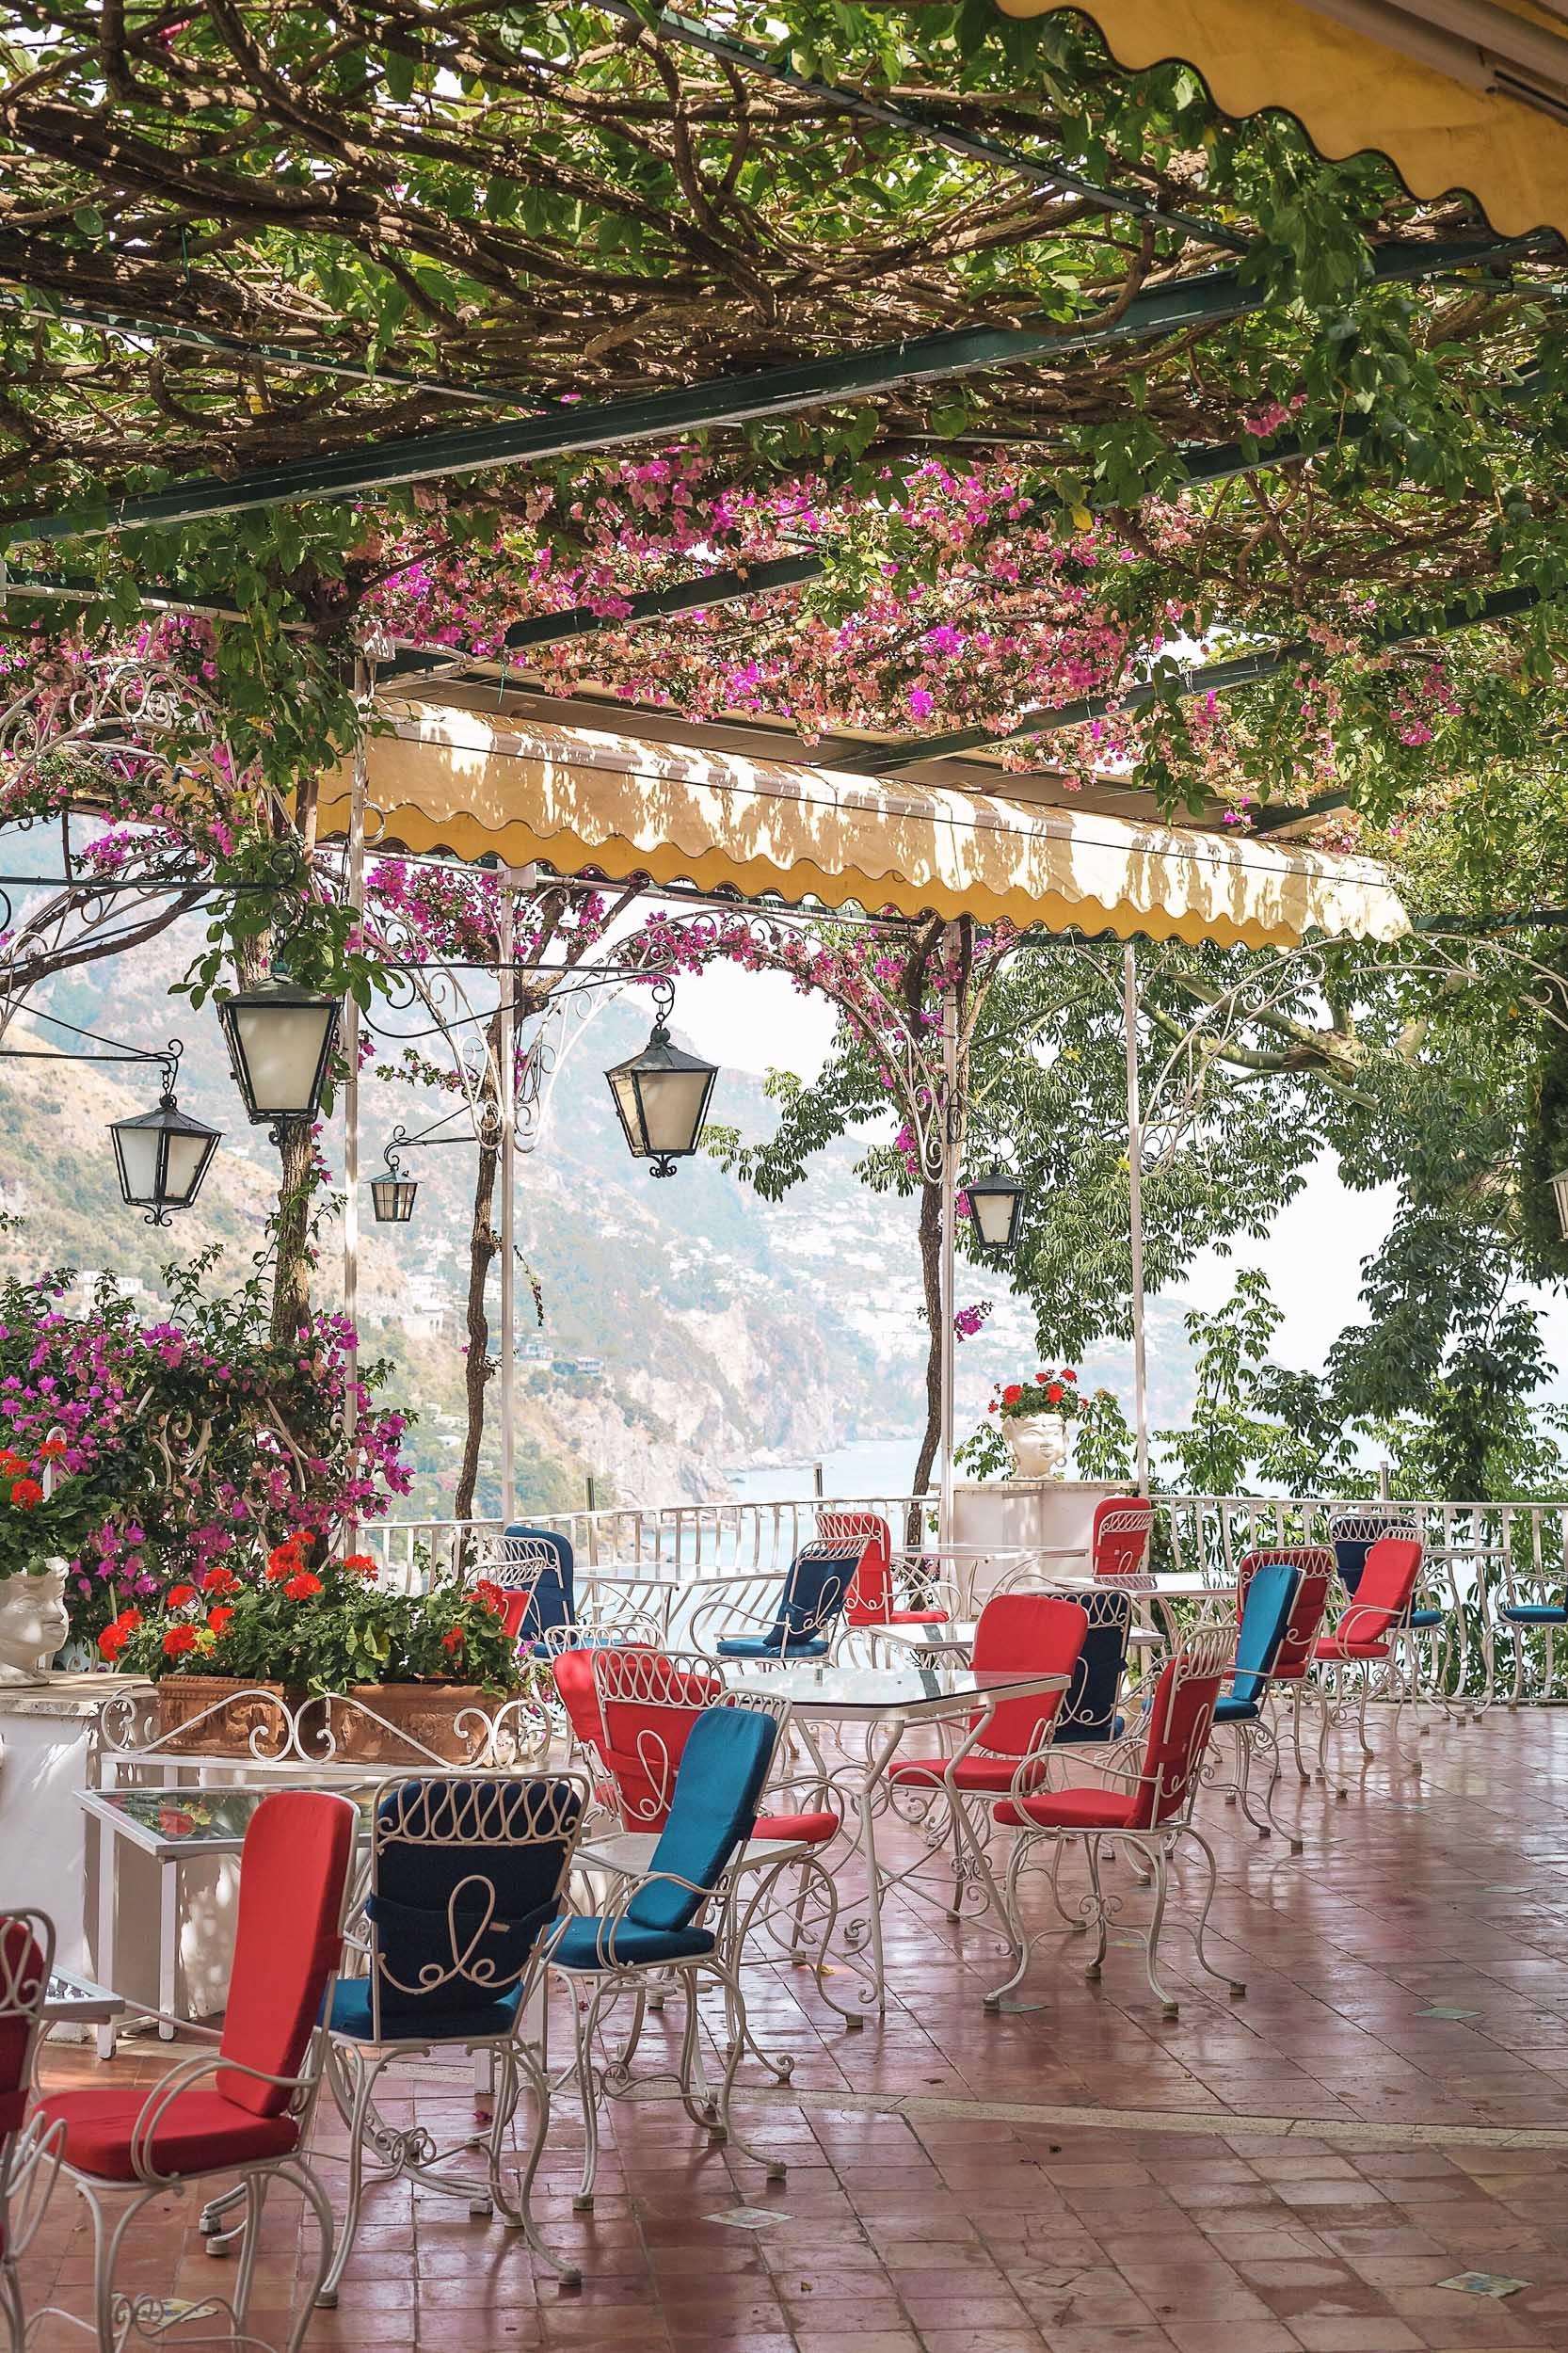 The absolutely gorgeous Hotel Poseidon